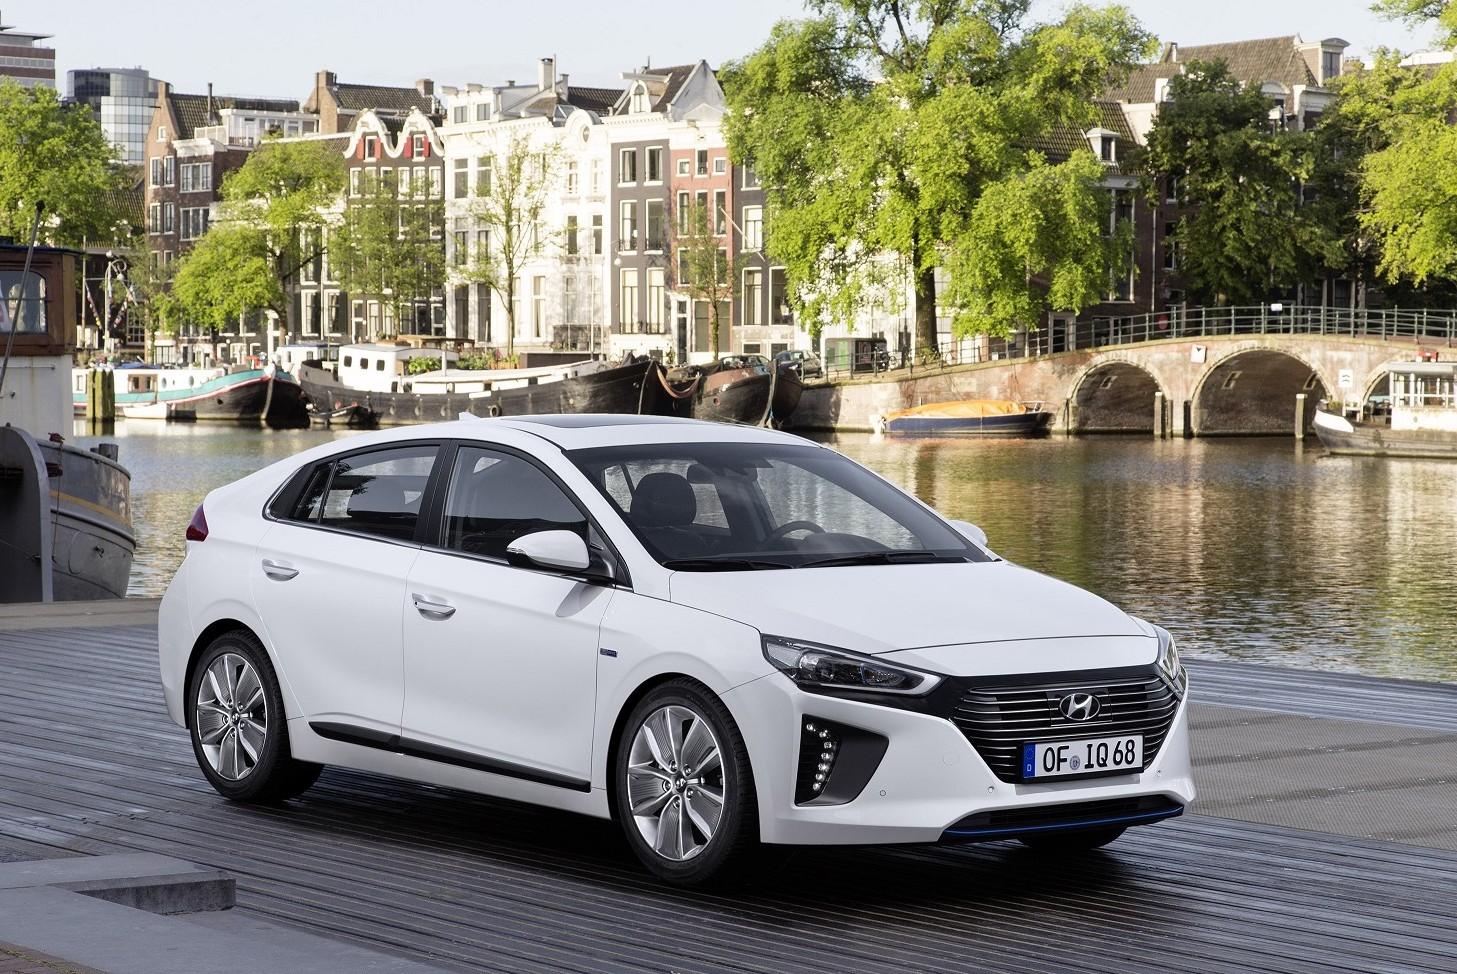 Ecobonus auto ibride 2019, gpl, metano i